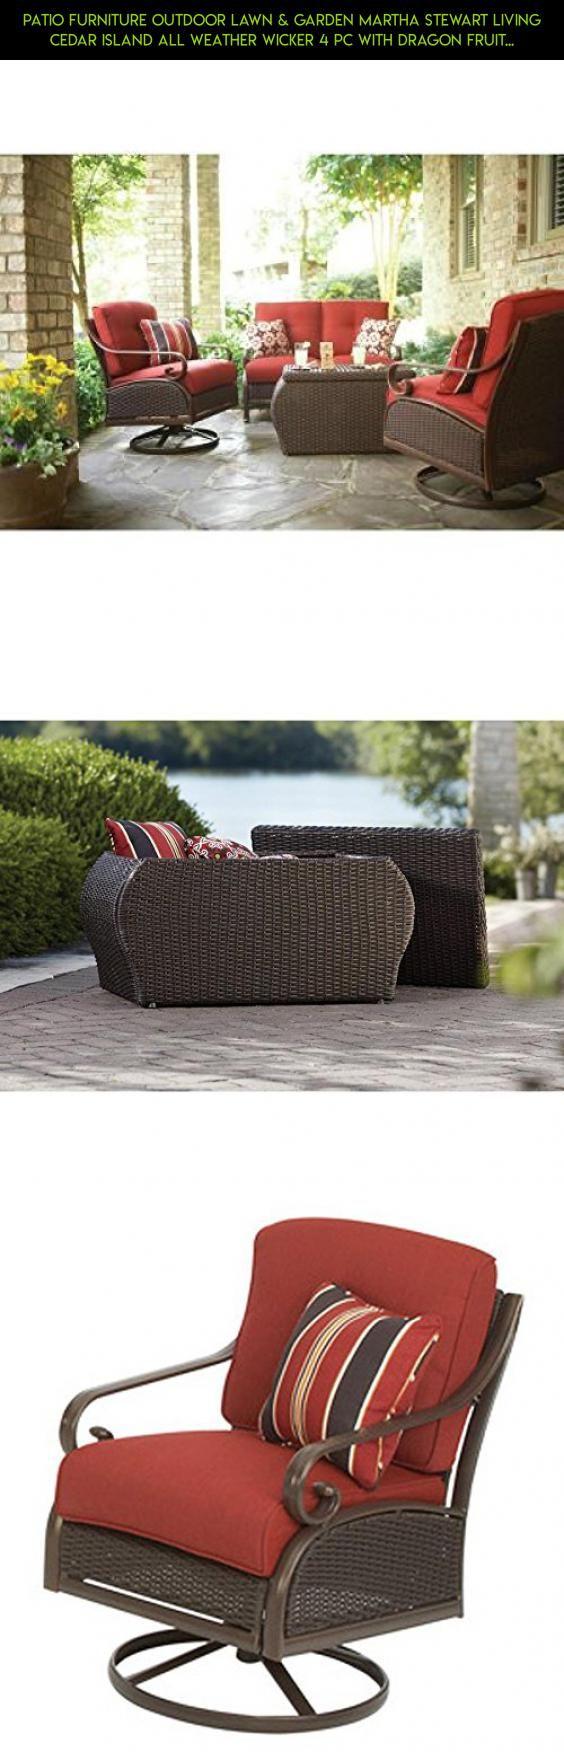 Superior Best 10+ Martha Stewart Patio Furniture Ideas On Pinterest | Wicker Patio  Furniture, Cheap Patio Cushions And Cheap Sofas Uk